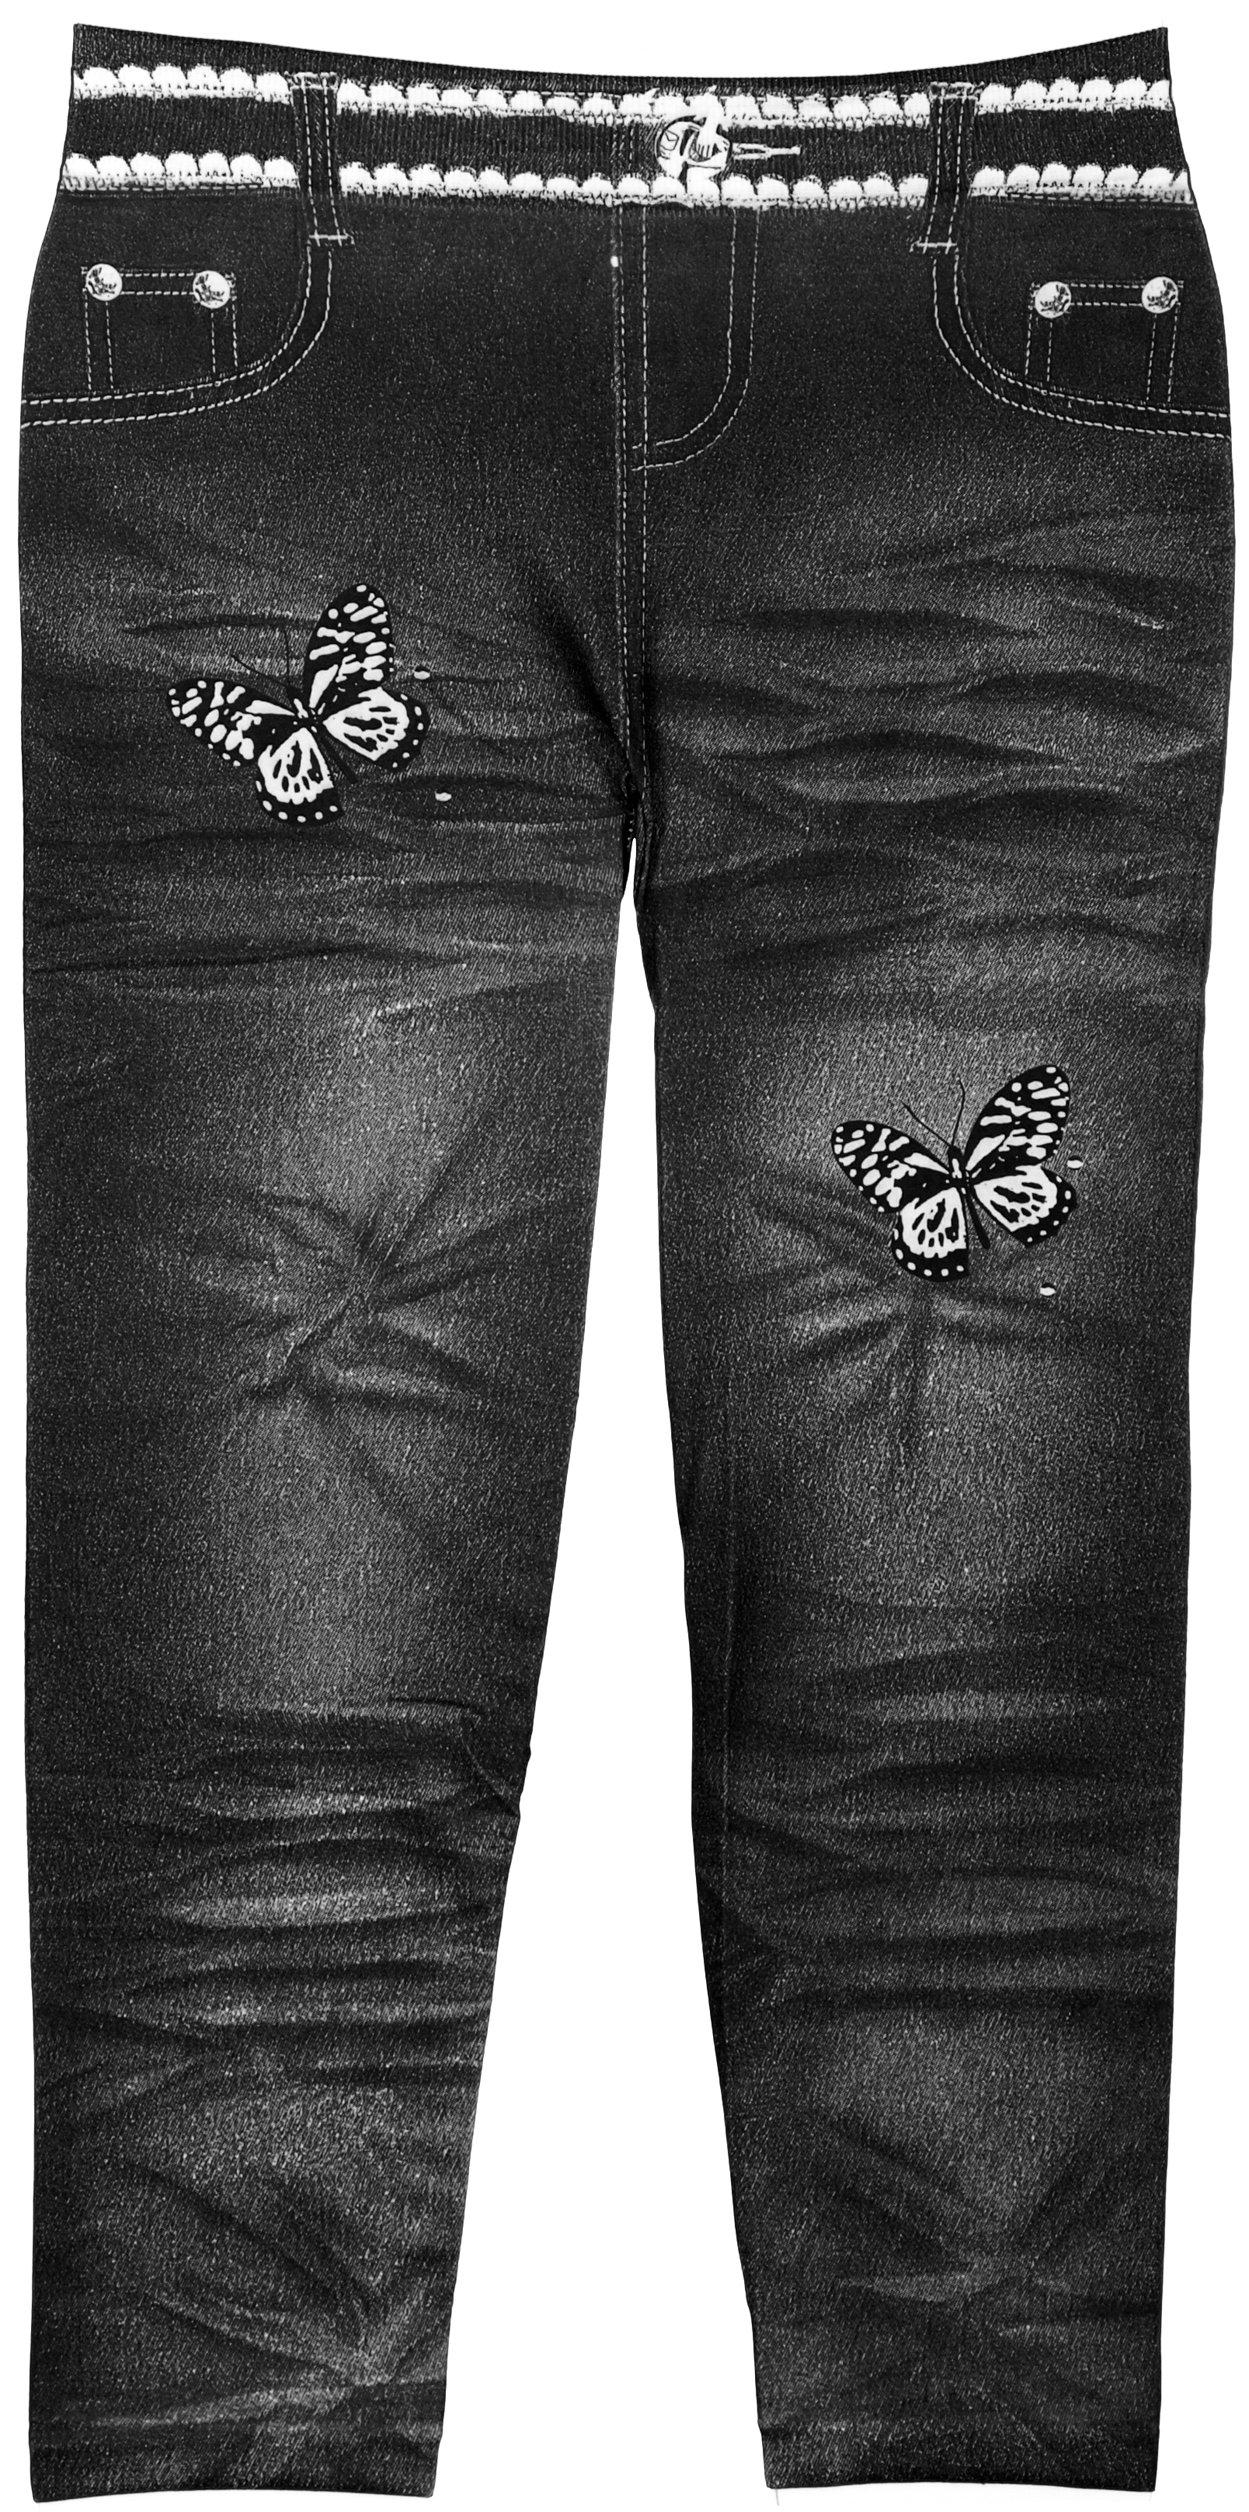 Girls Fashion Leggings with Vivid Colors & Fun Patterns in 3 Sizes (7-16, 27572 Black)